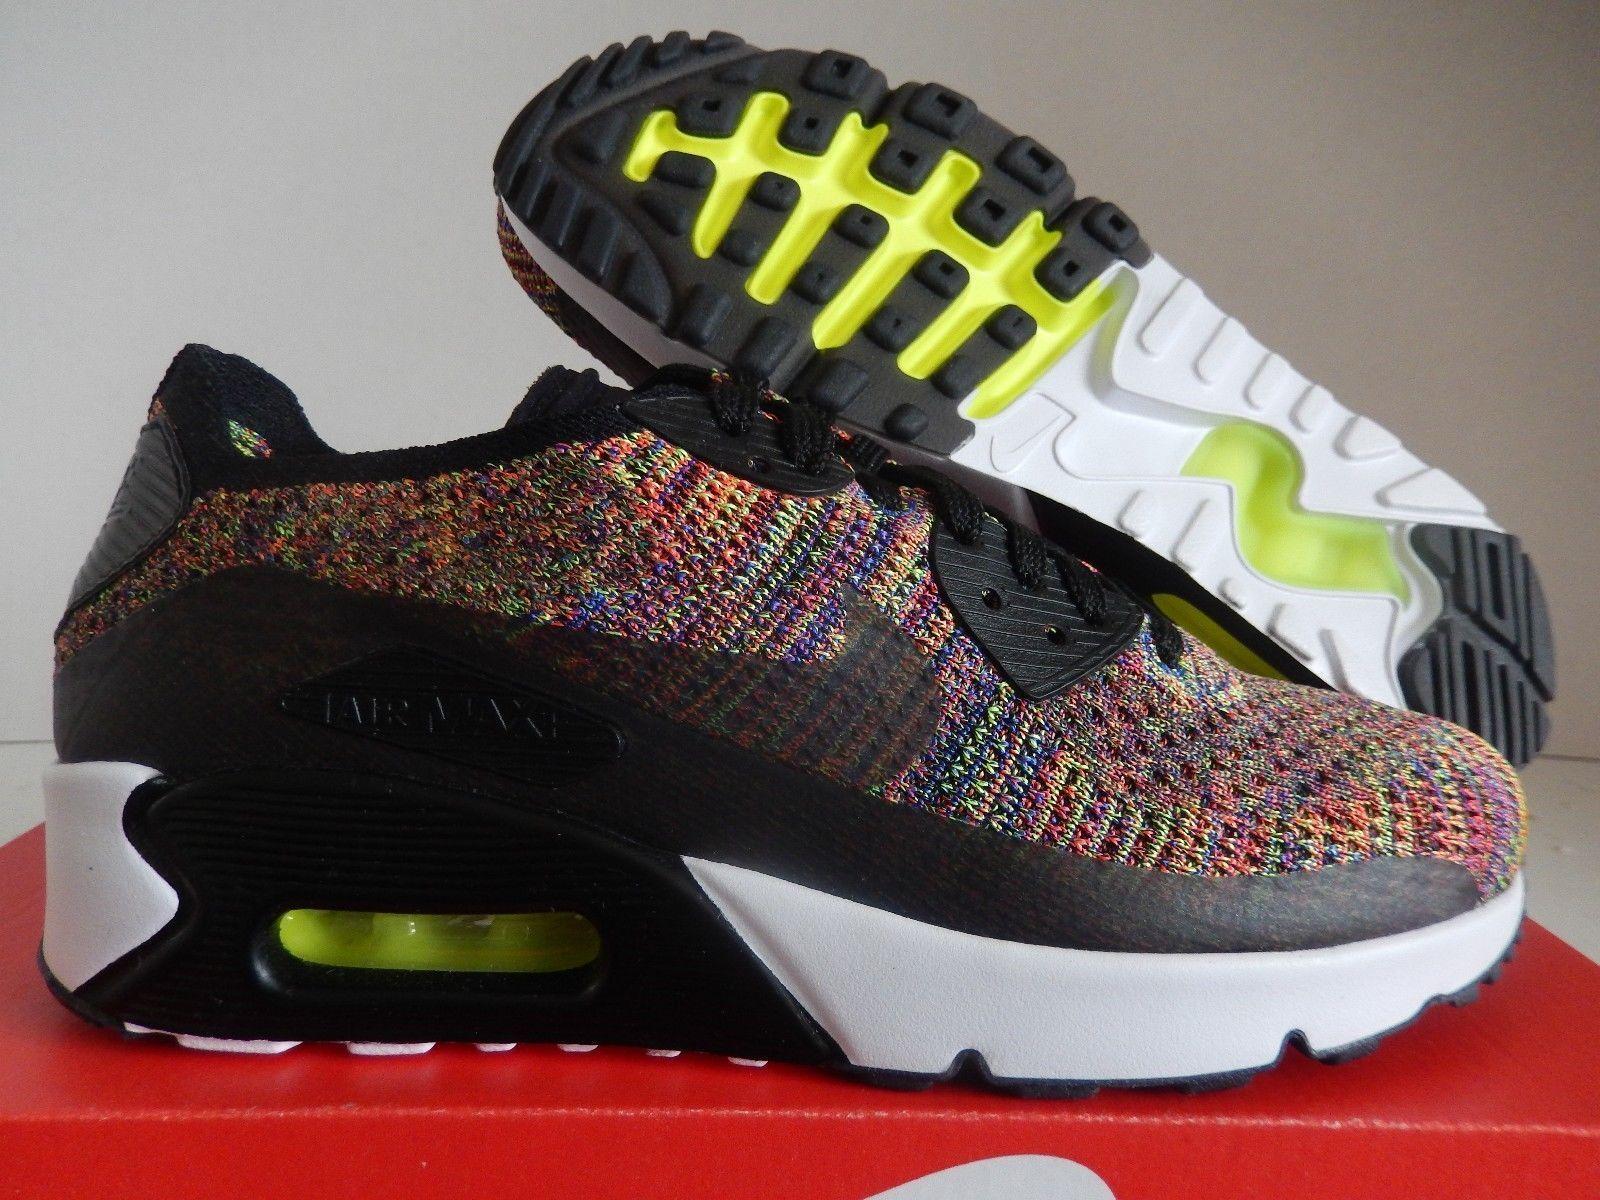 Nike air max 90 ultra flyknit uomini neri / raggiante (875943-002 sz 13)